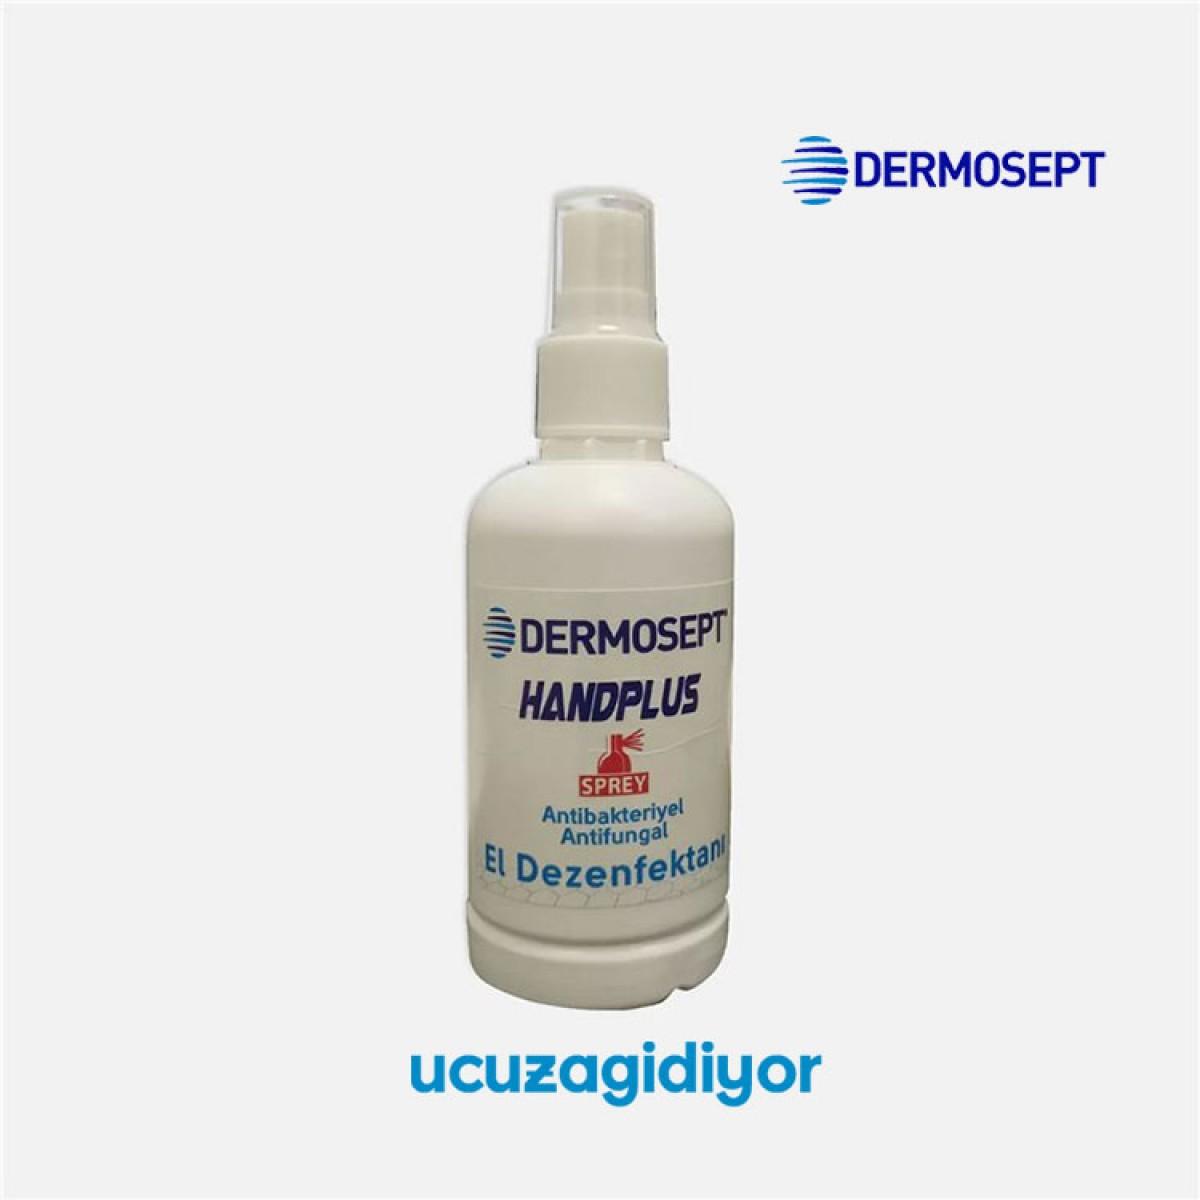 dermosept antibakteriyel el dezenfektani sprey 100ml